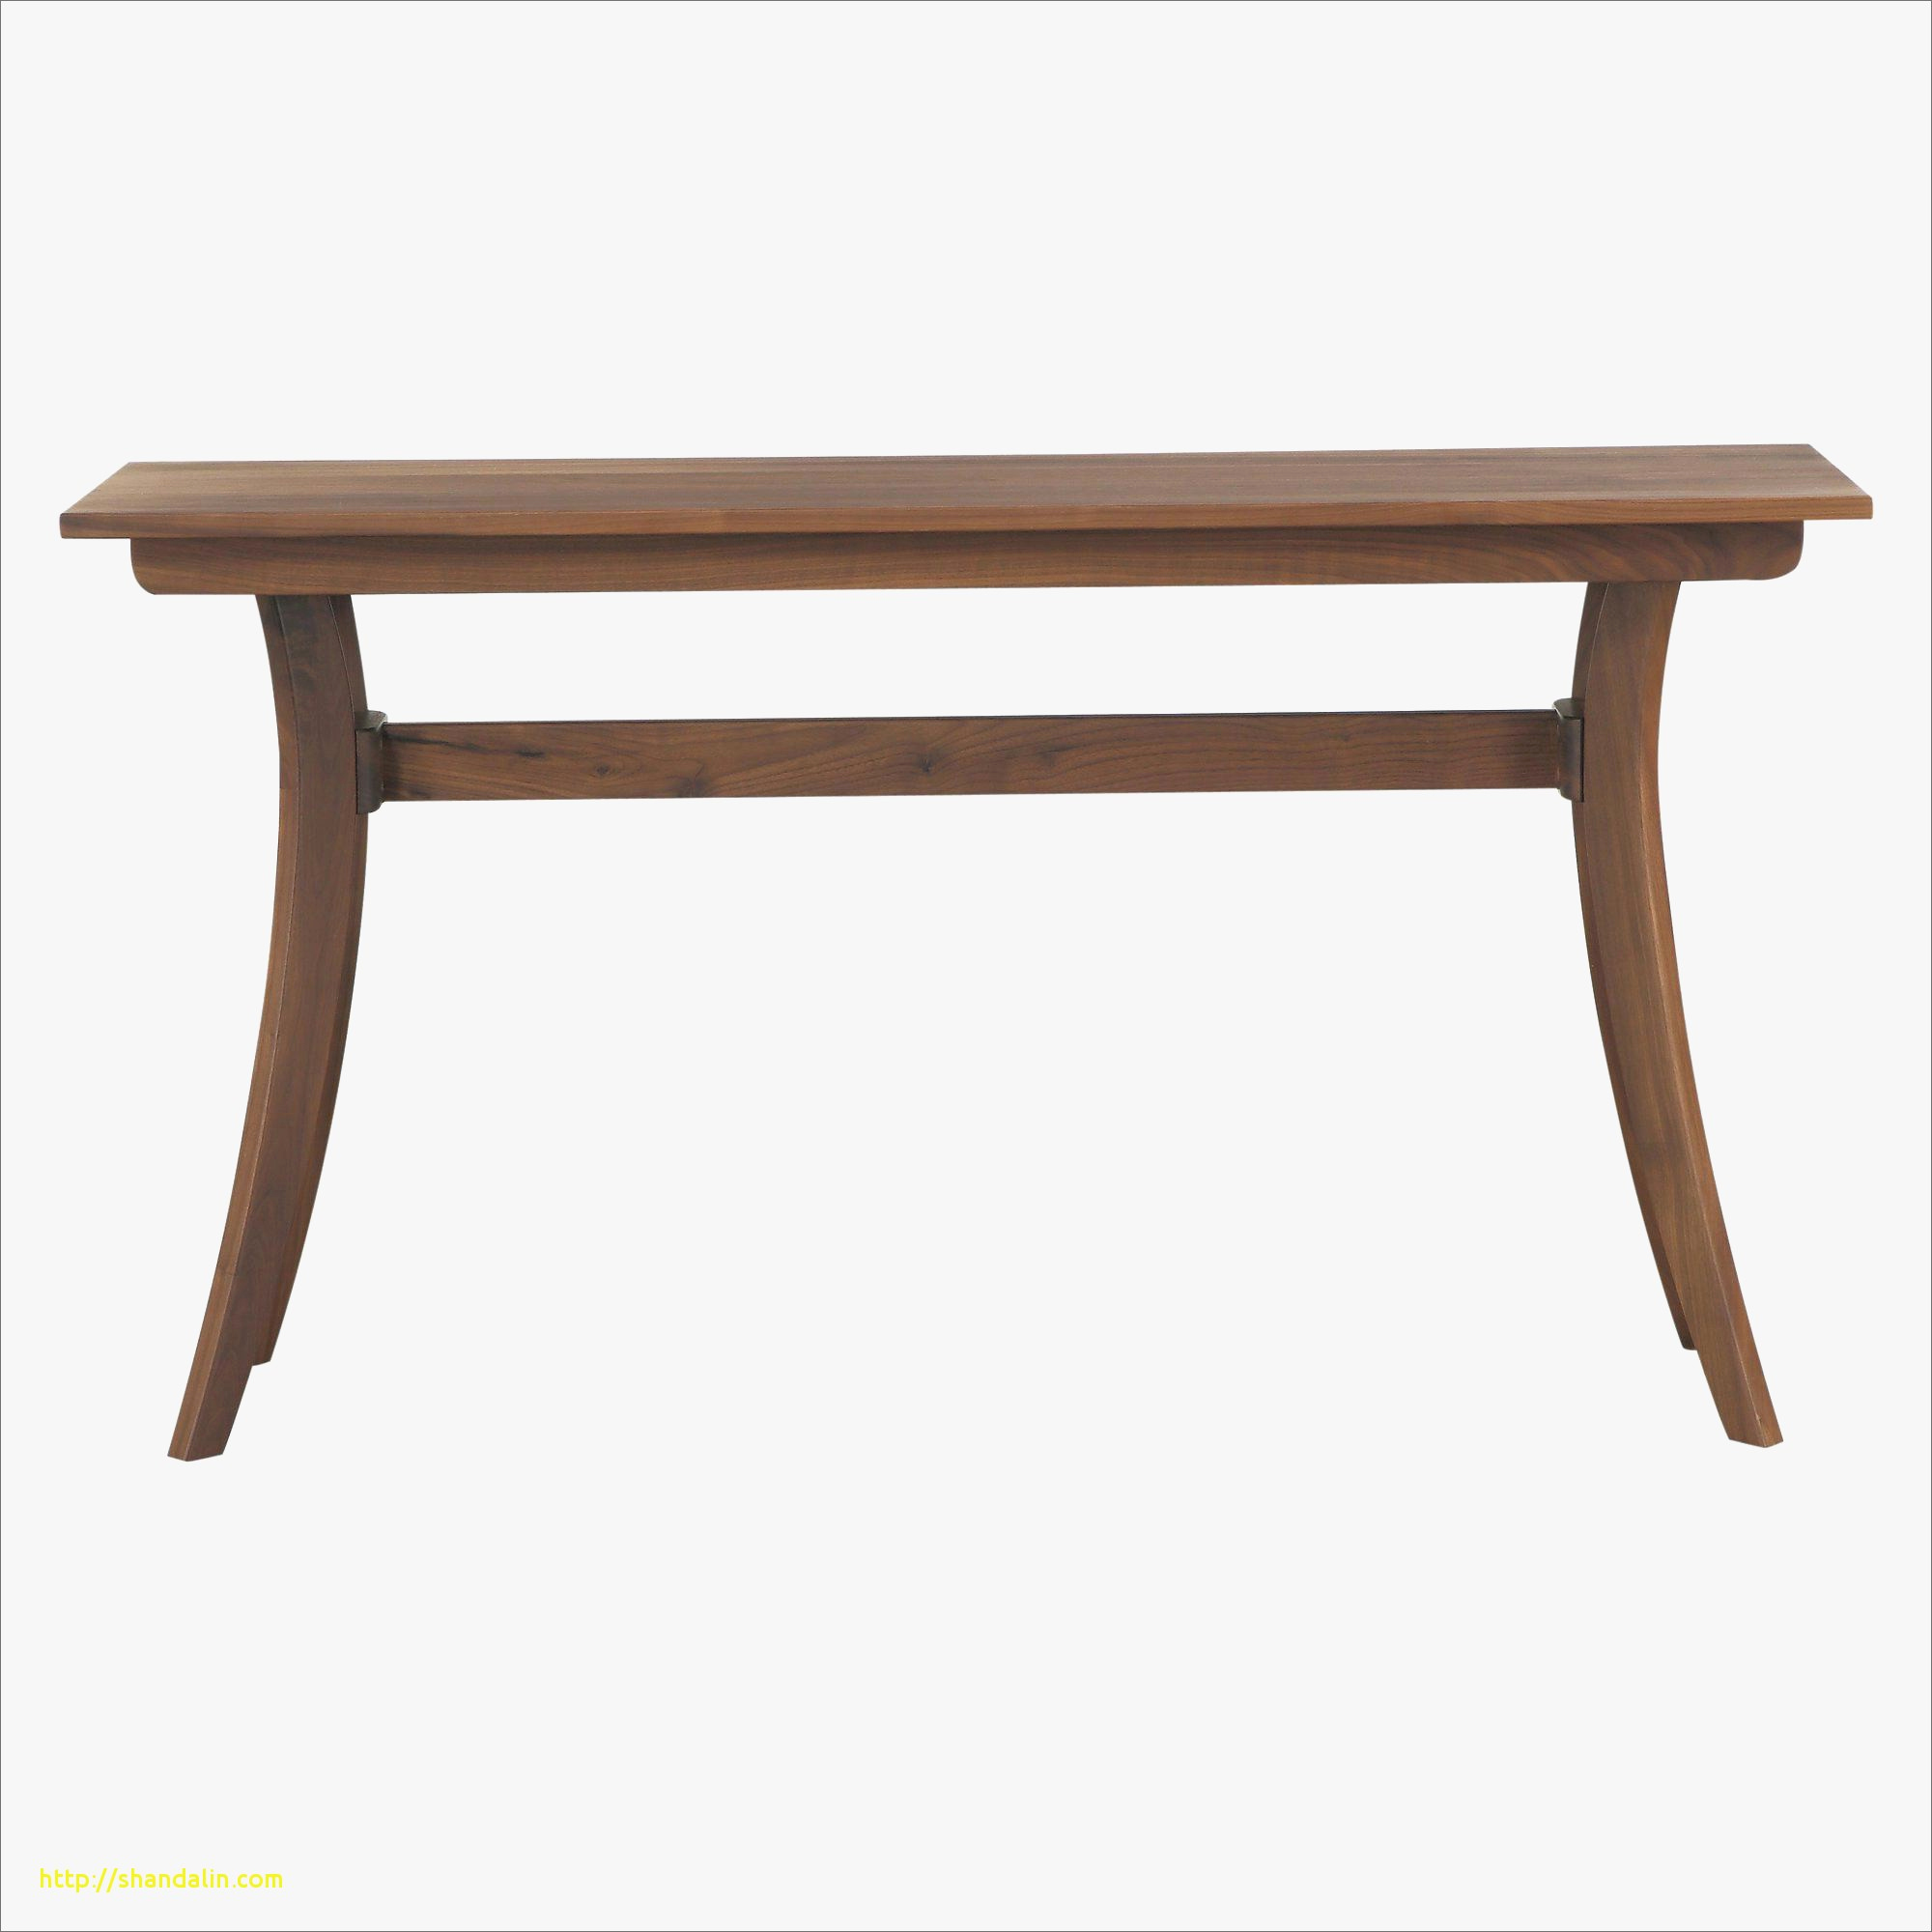 table de camping leclerc inspirant photos chaise pliante. Black Bedroom Furniture Sets. Home Design Ideas